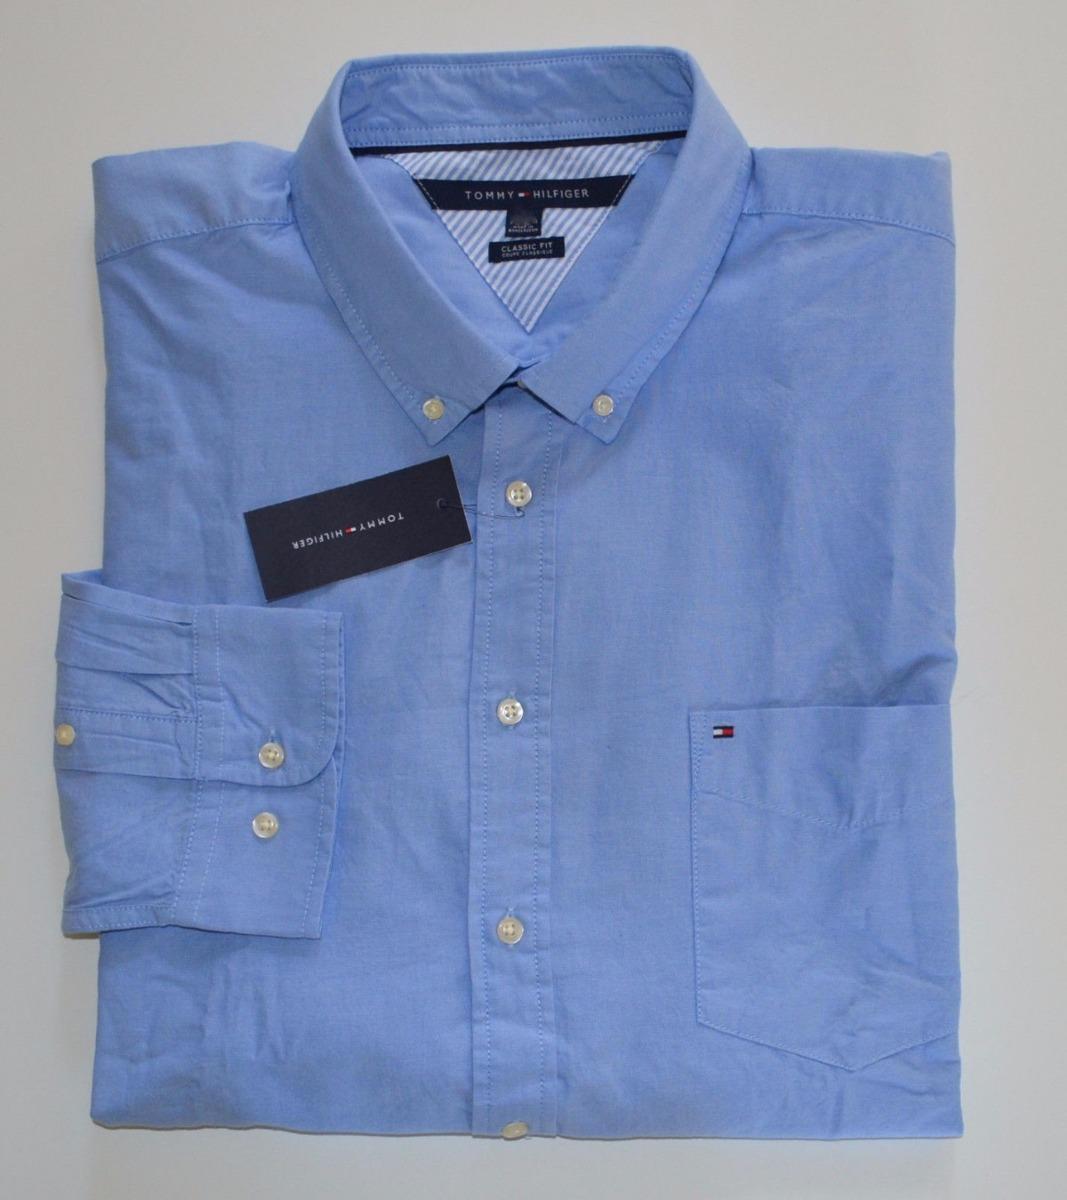 camisa social tommy hilfiger tamanho p s modelos classic fit. Carregando  zoom. 47270c3457aa8